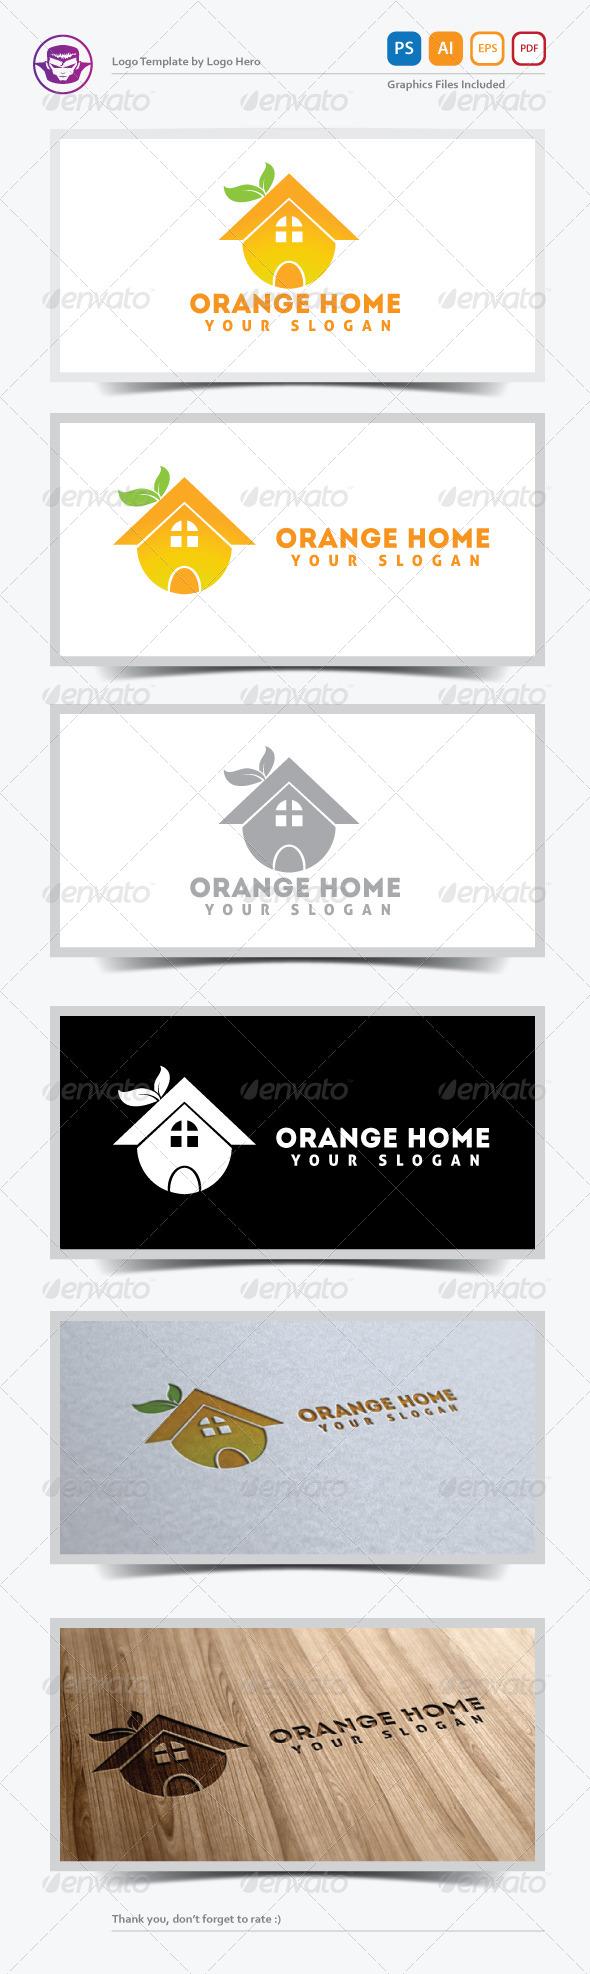 GraphicRiver Orange Home Logo Template 5268855